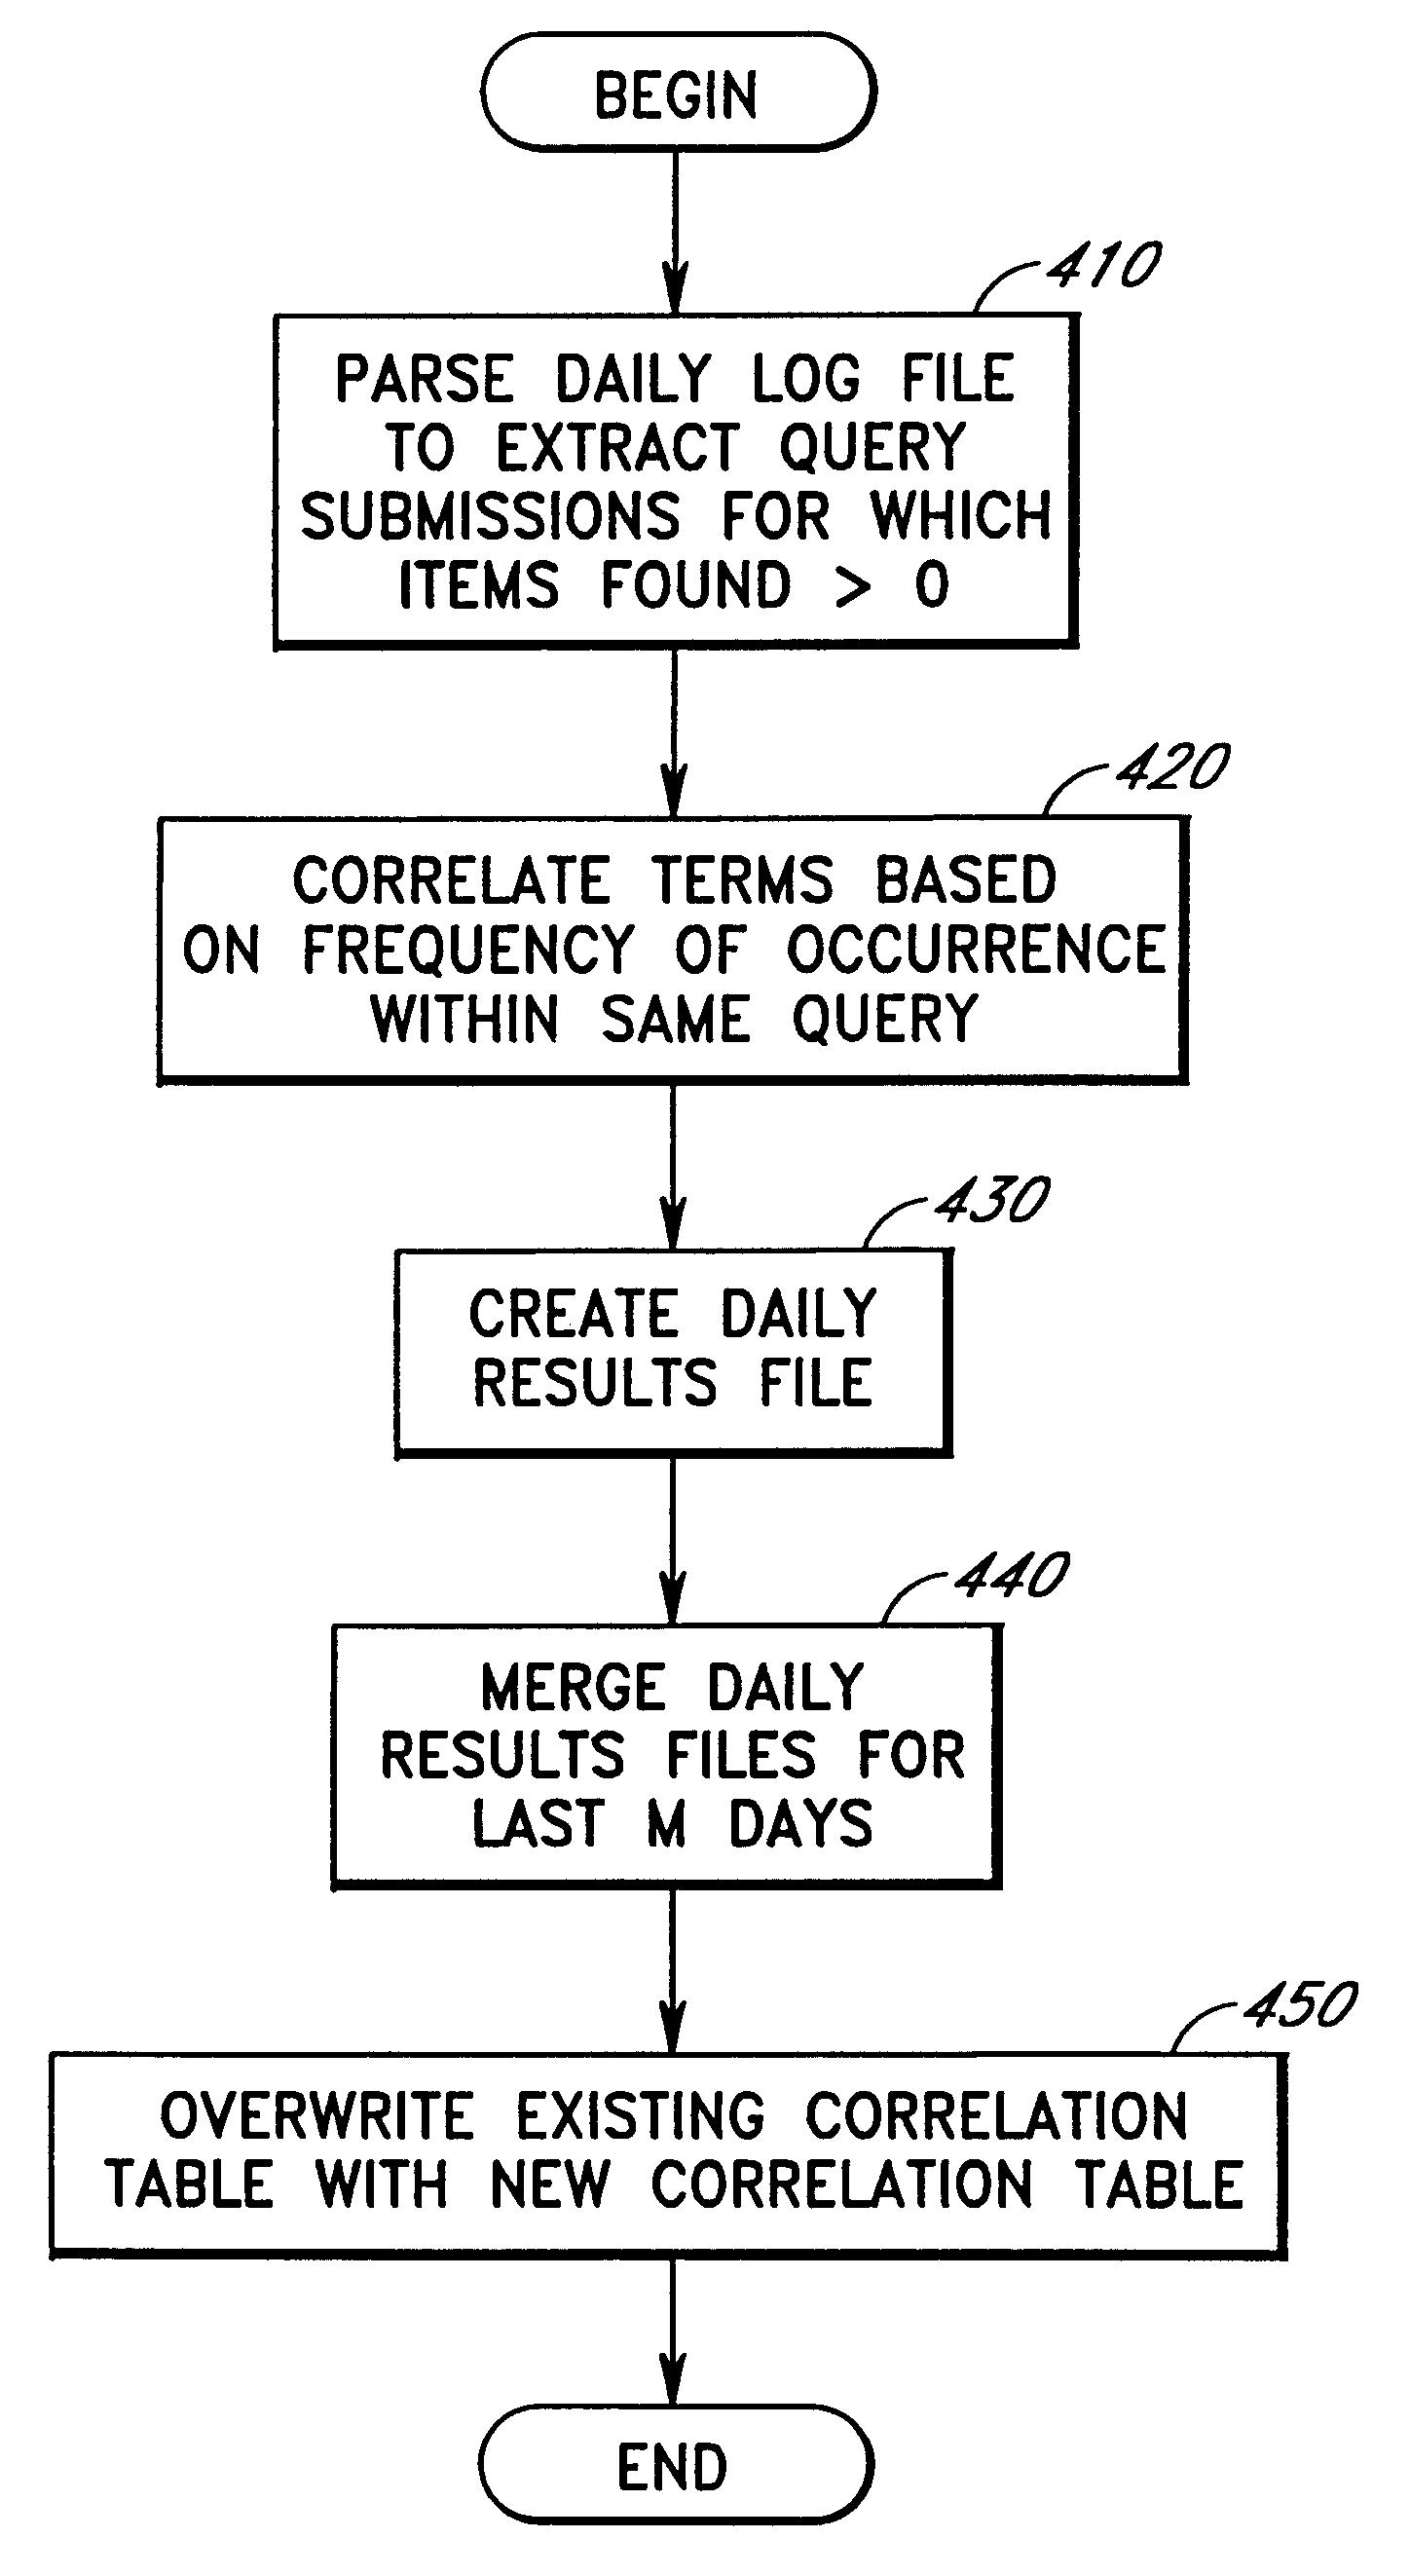 Patent US 6,169,986 B1